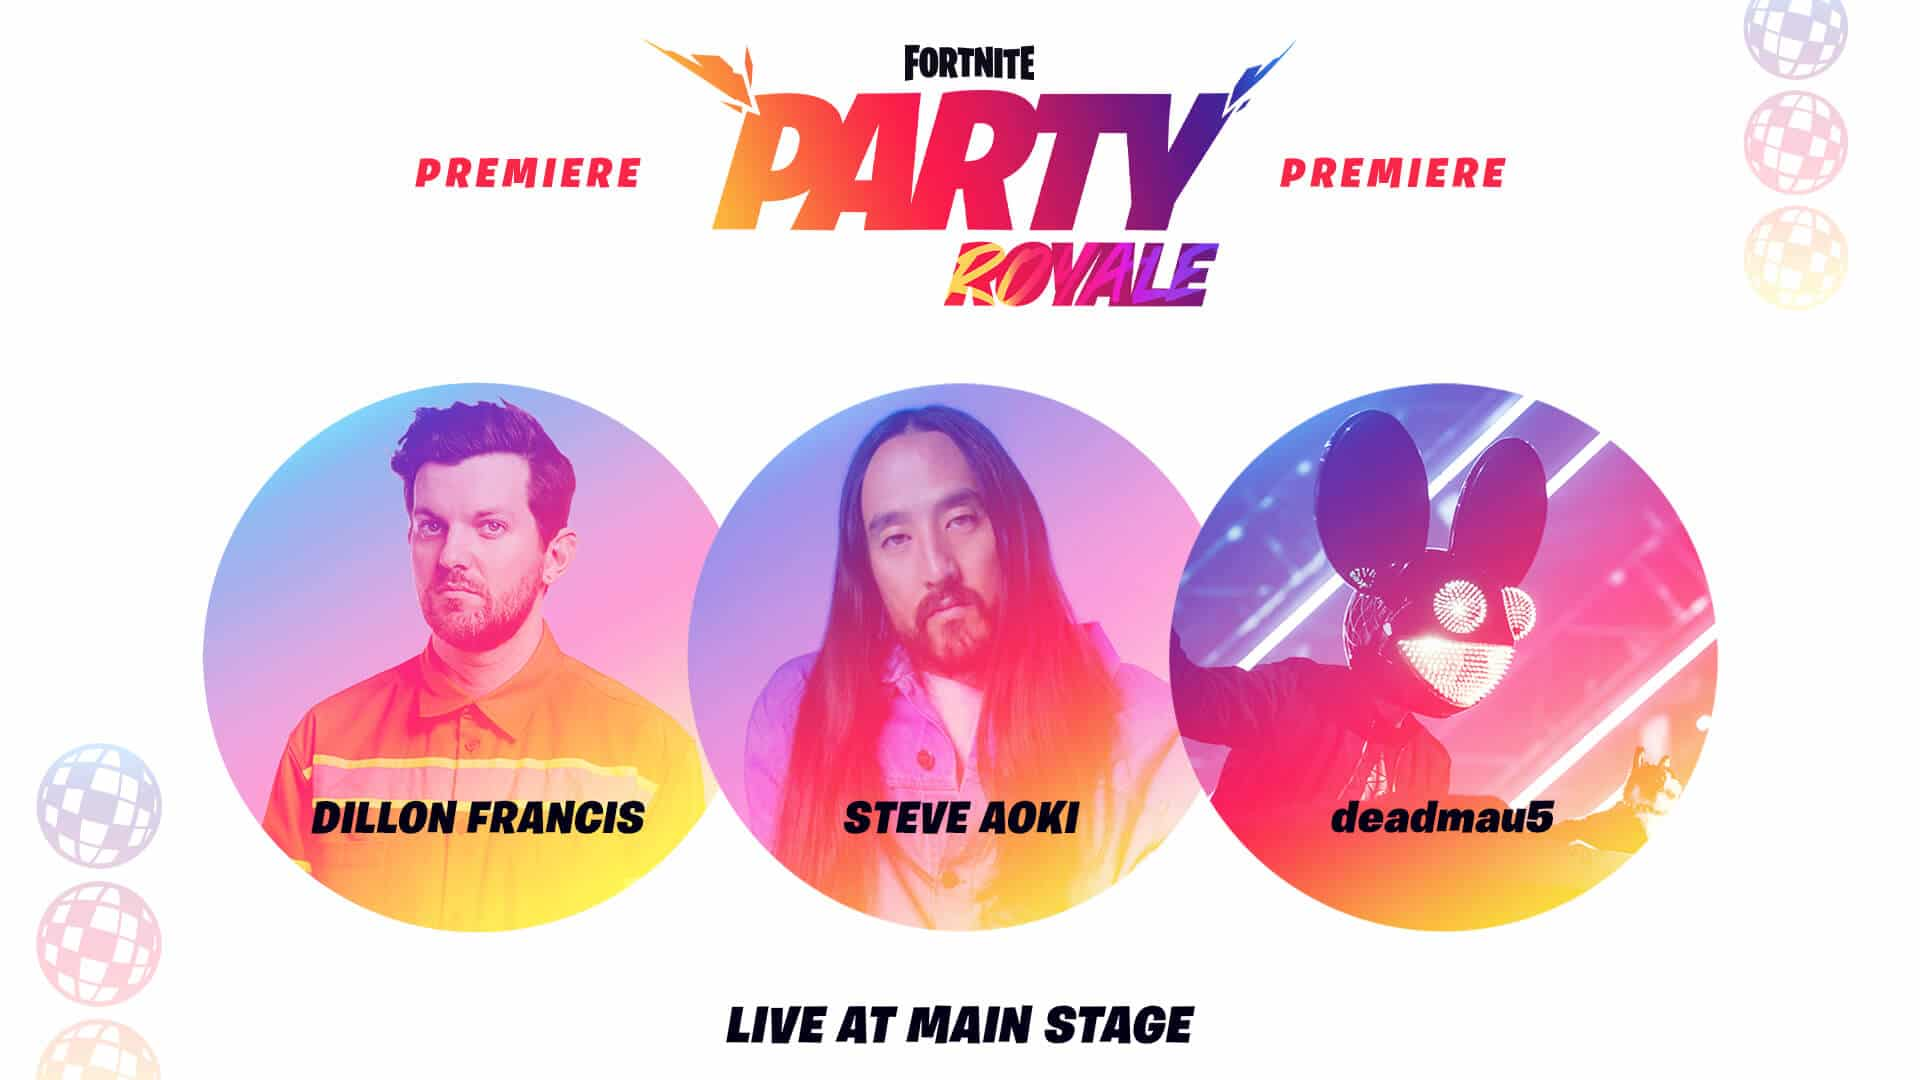 Fortnite Party Royale Premiere